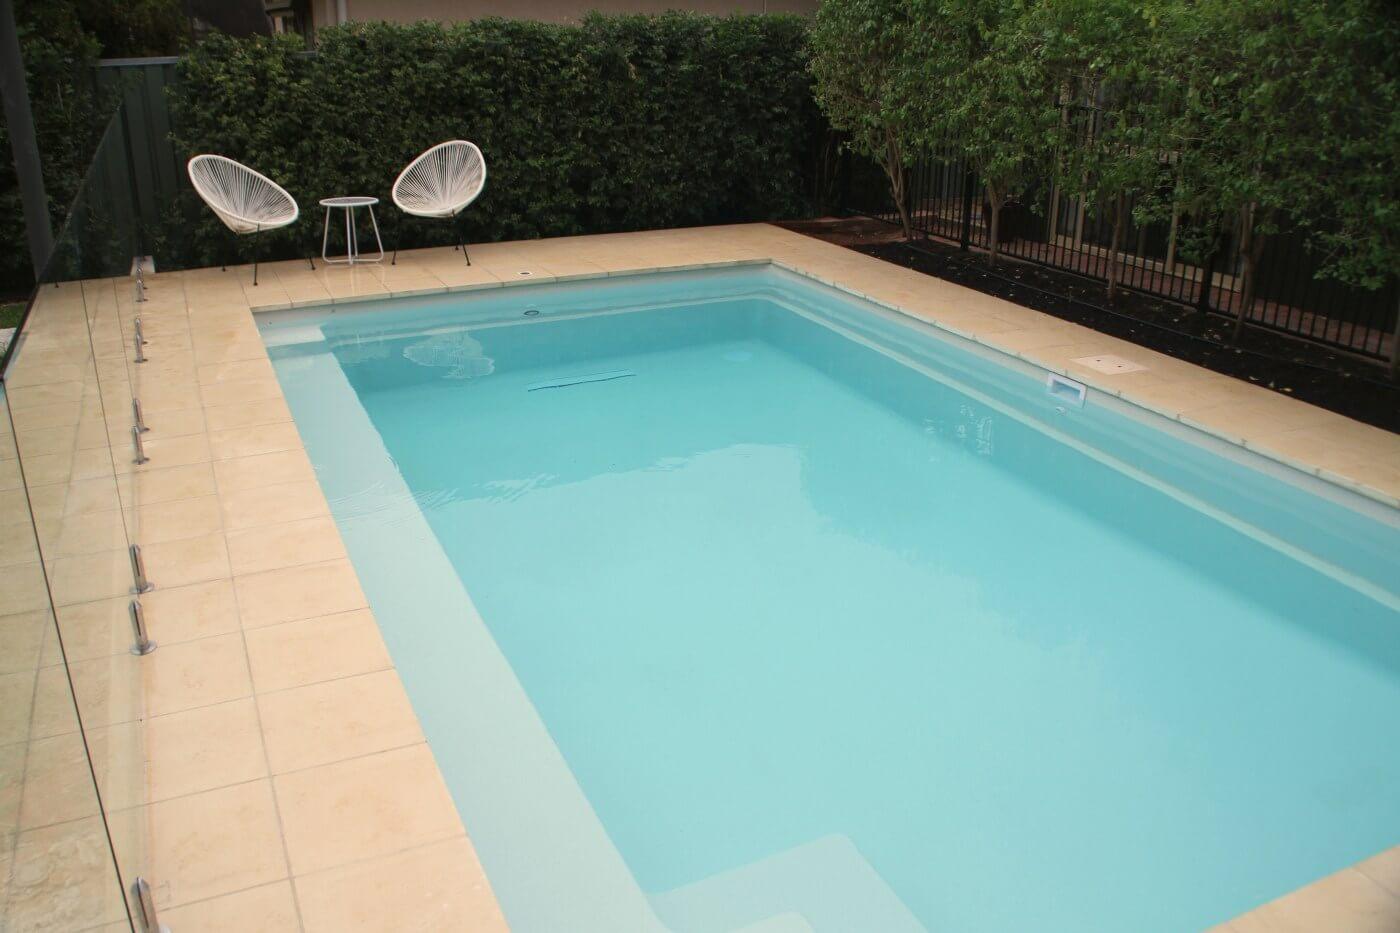 Sanctuary Pool - Relax and Family Fun | Compass Pools Australia